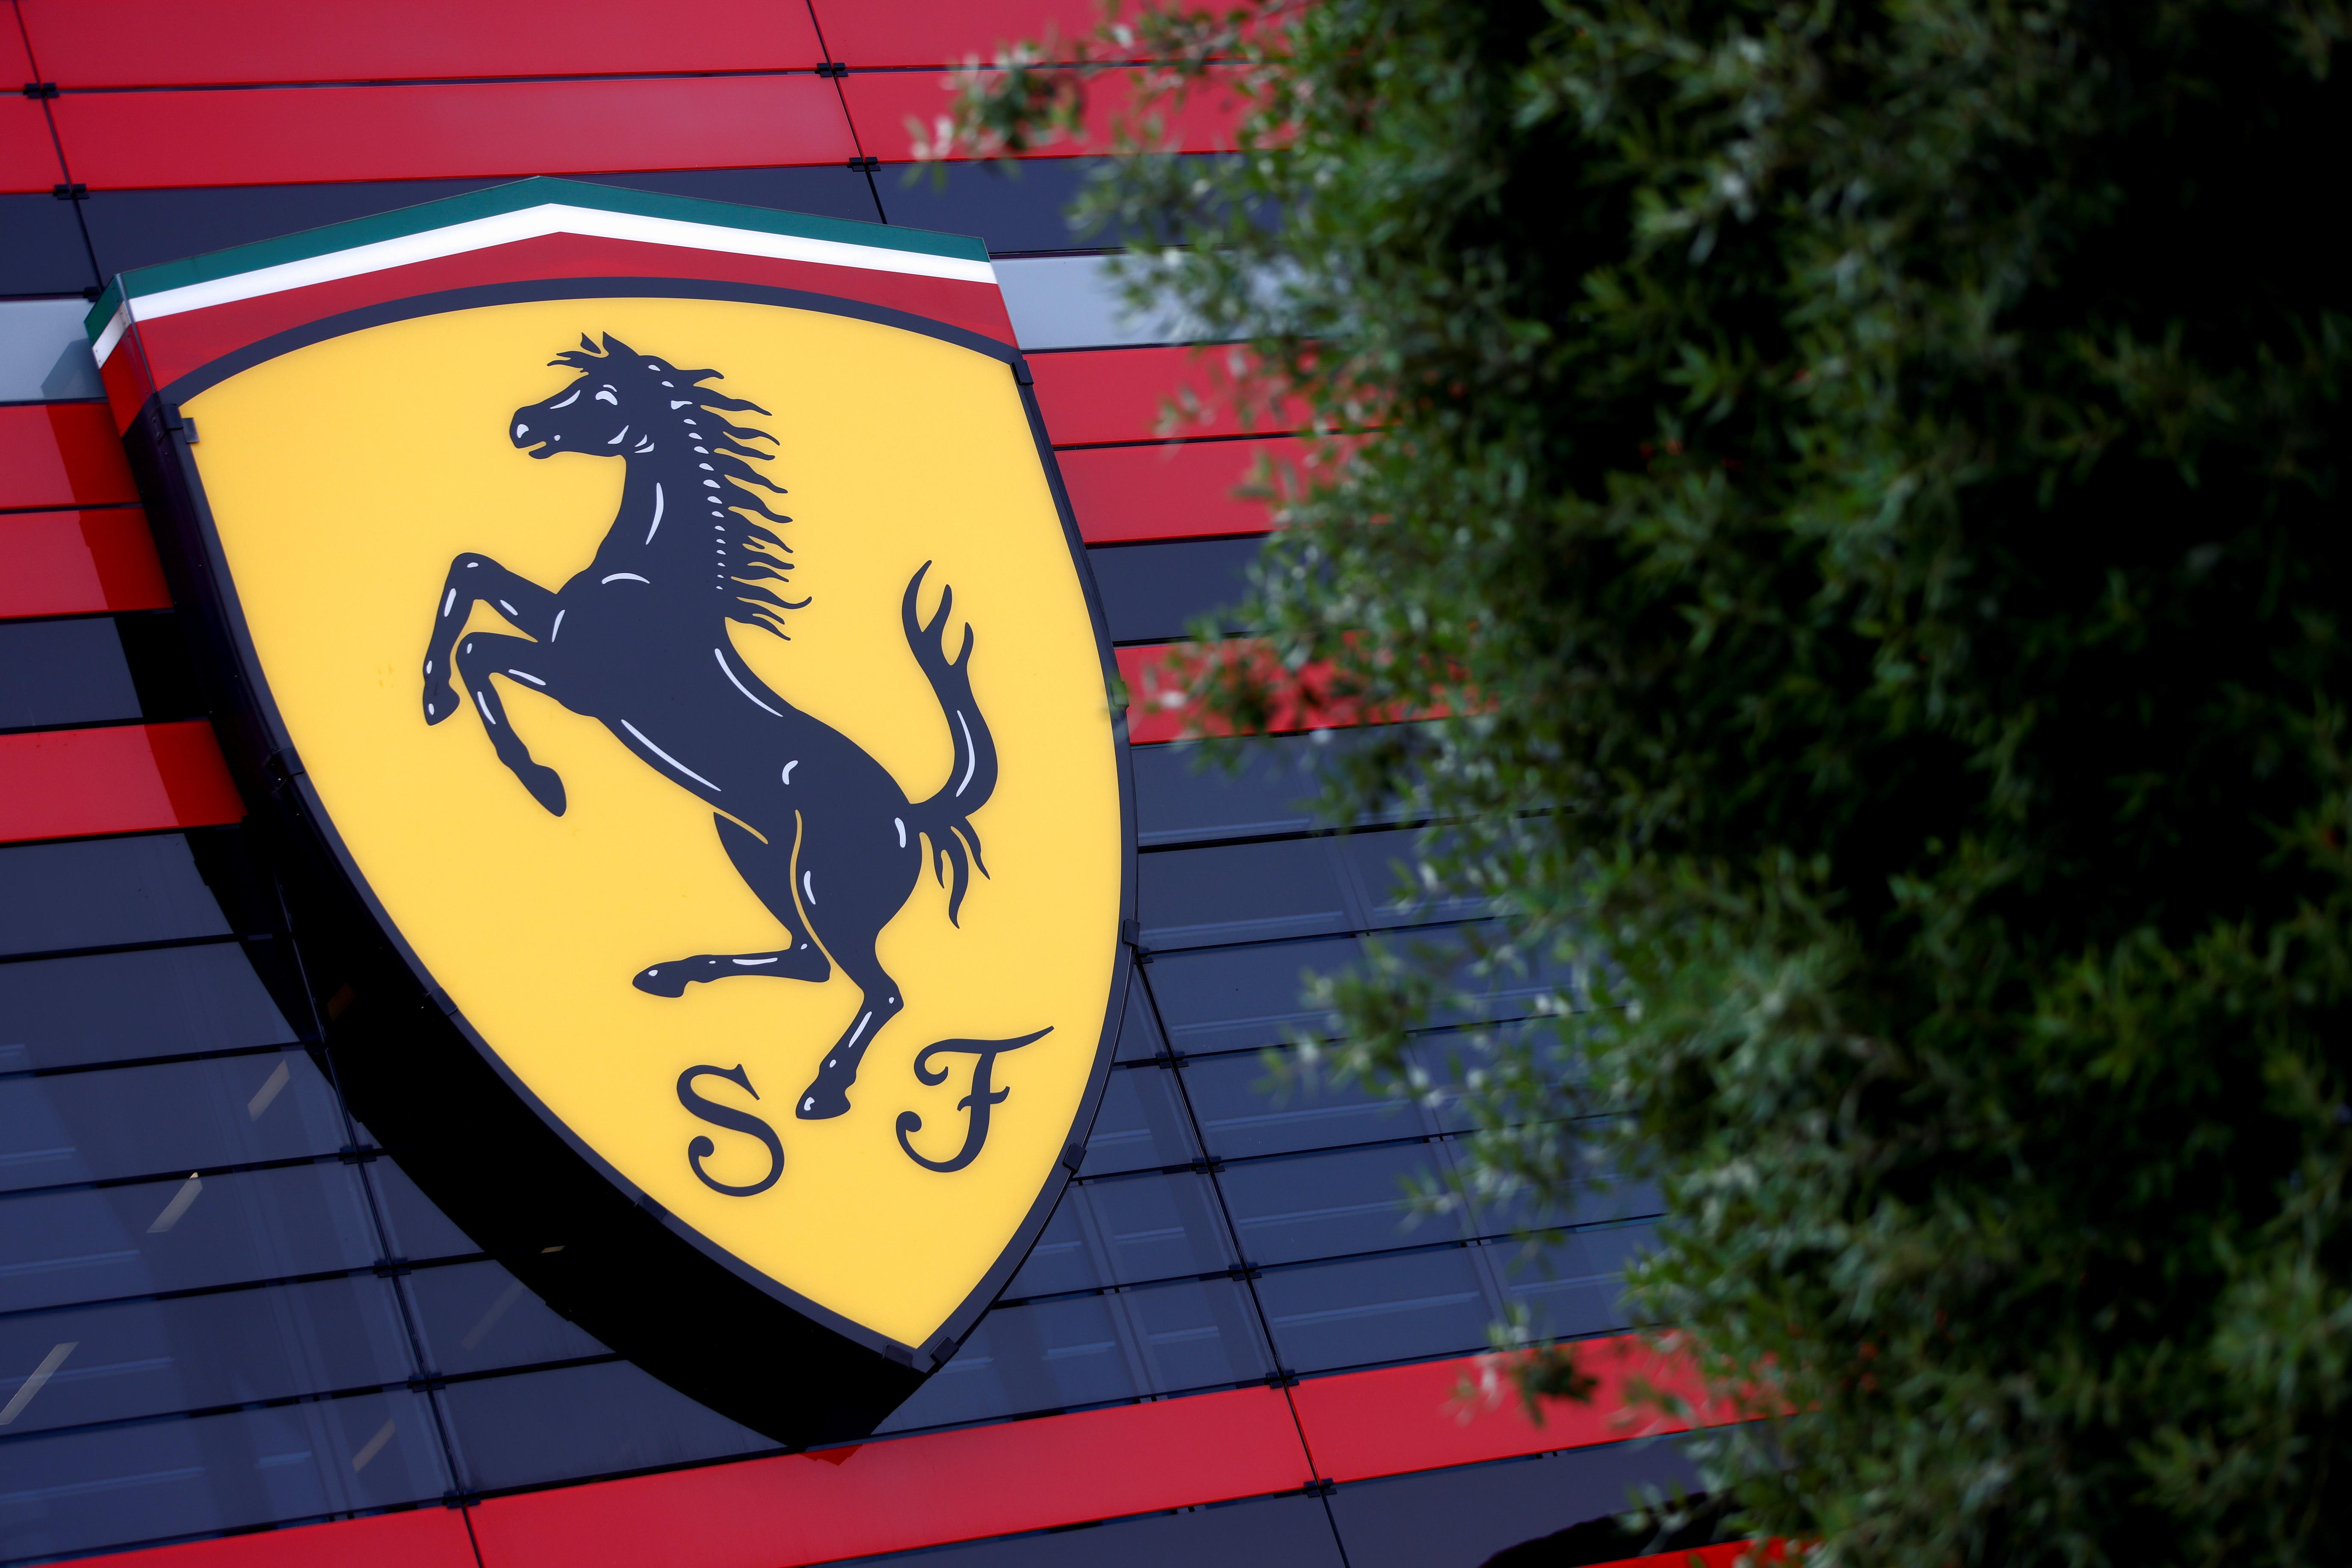 The Ferrari logo is seen at the company's headquarters in Maranello, Italy, June 8, 2021. Picture taken June 8, 2021. REUTERS/Guglielmo Mangiapane